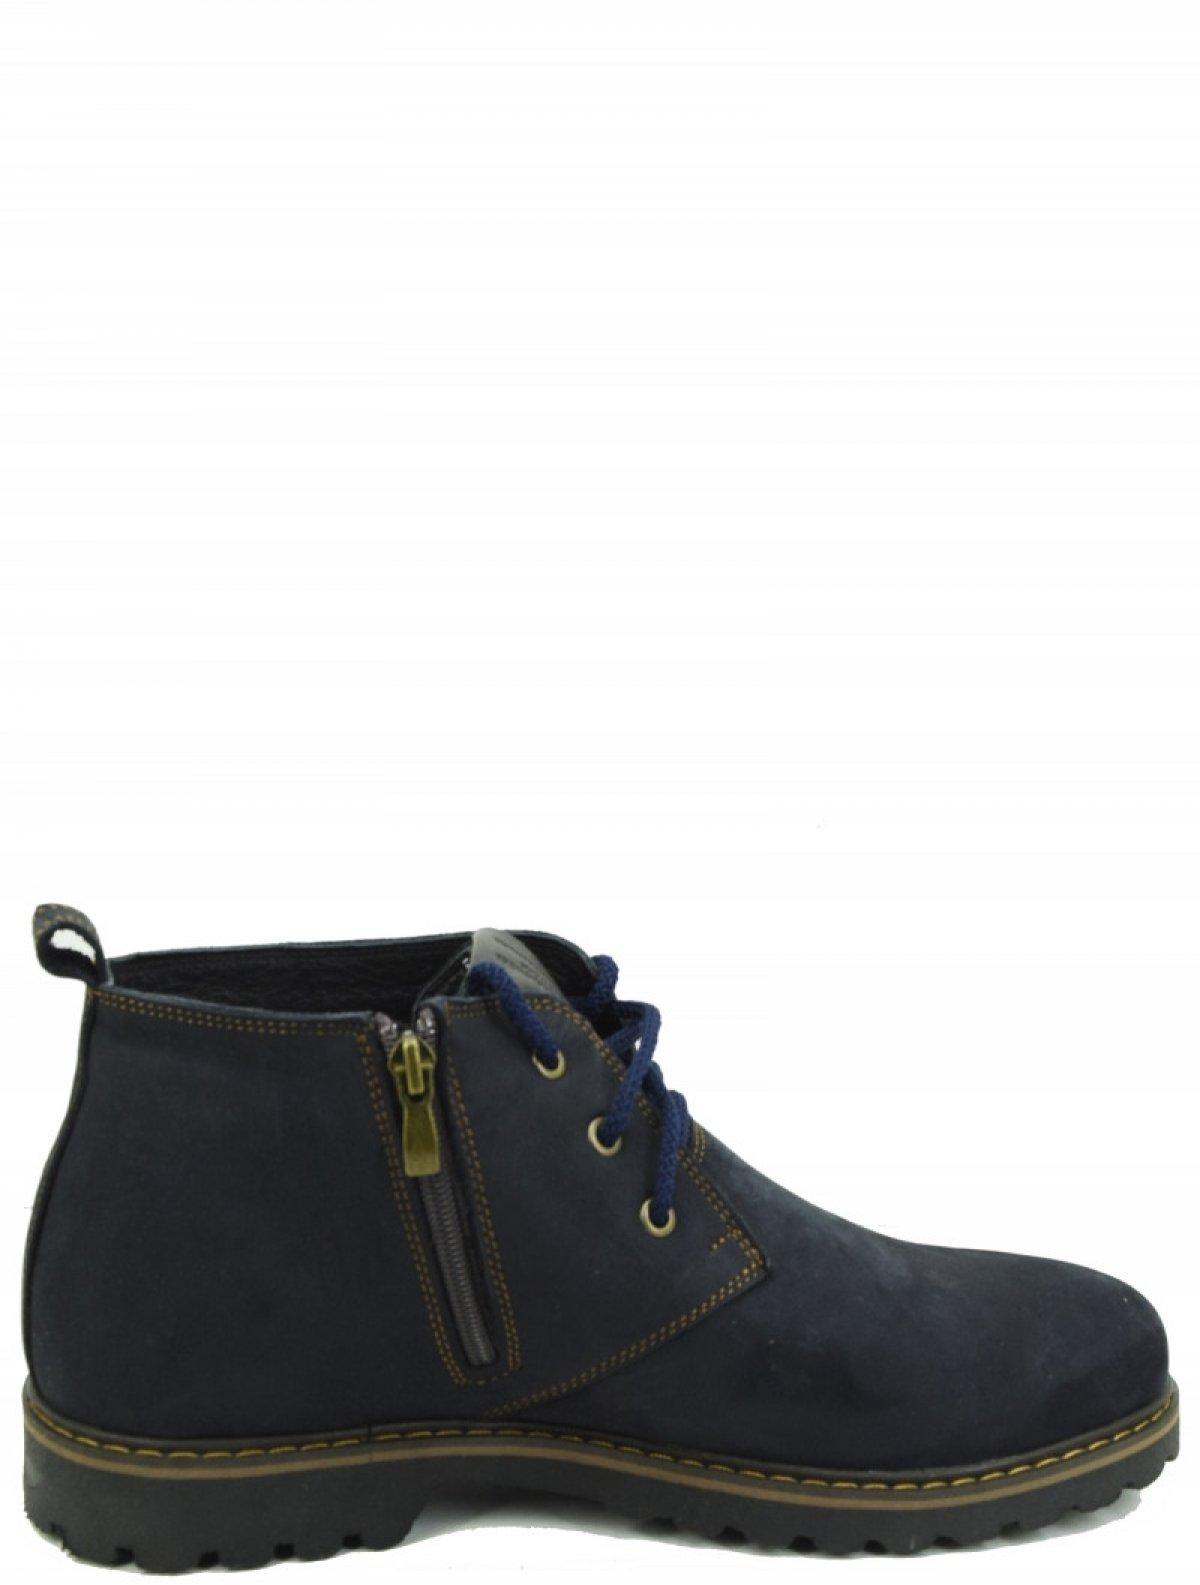 Baratto 5-239-004-2 мужские ботинки